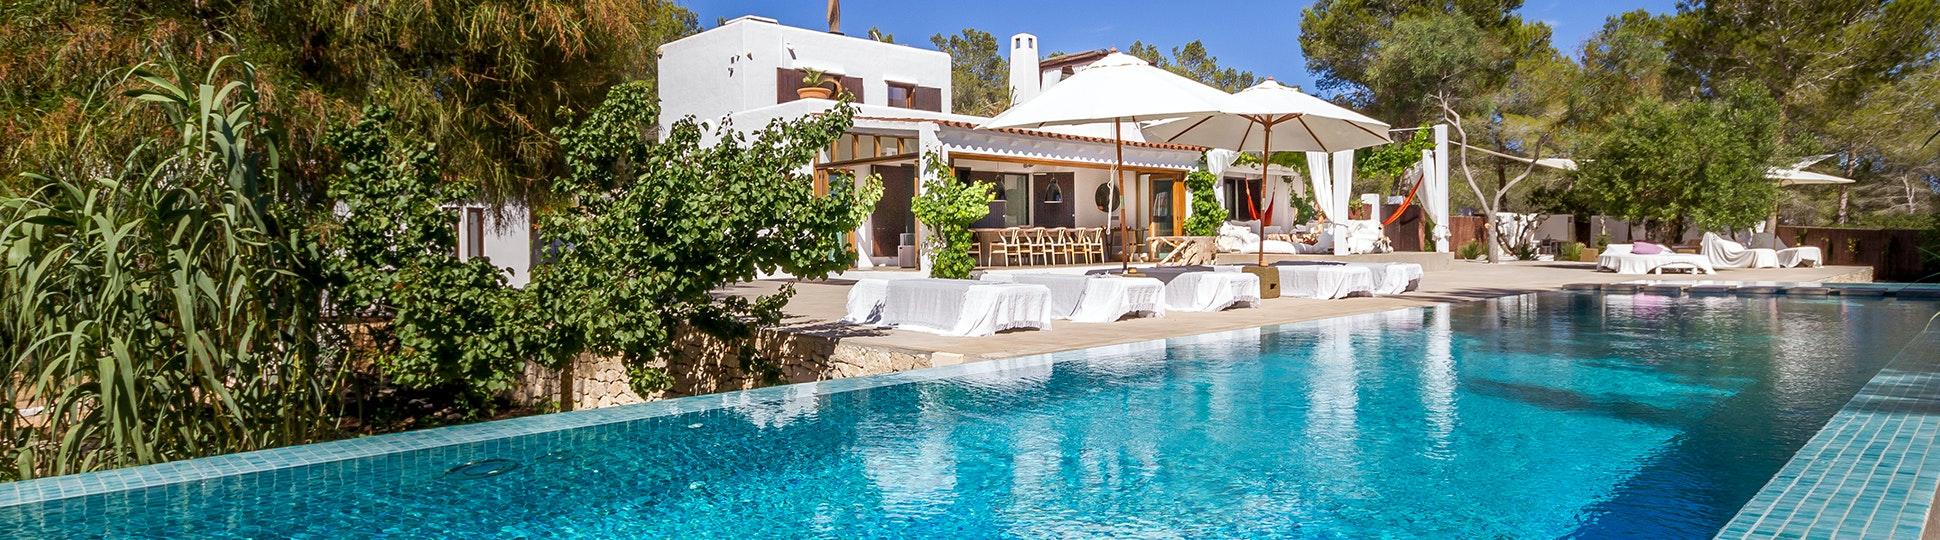 Amazing Exterior And Pool Area At Casa Del Jondal, Ibiza, Spain Nice Ideas